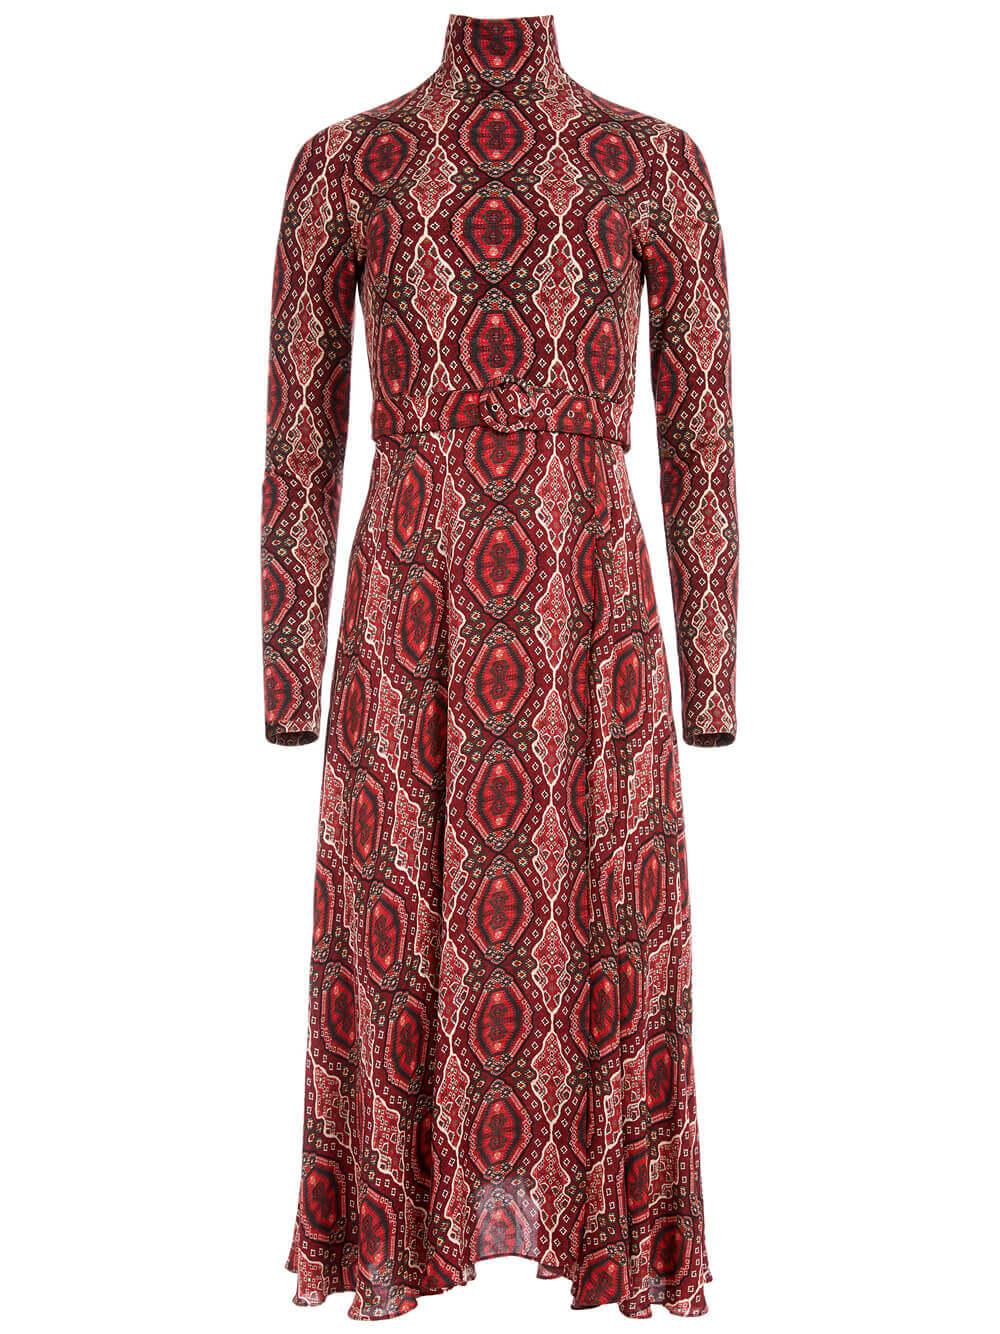 Clare Turtleneck Dress Item # CC009P55507